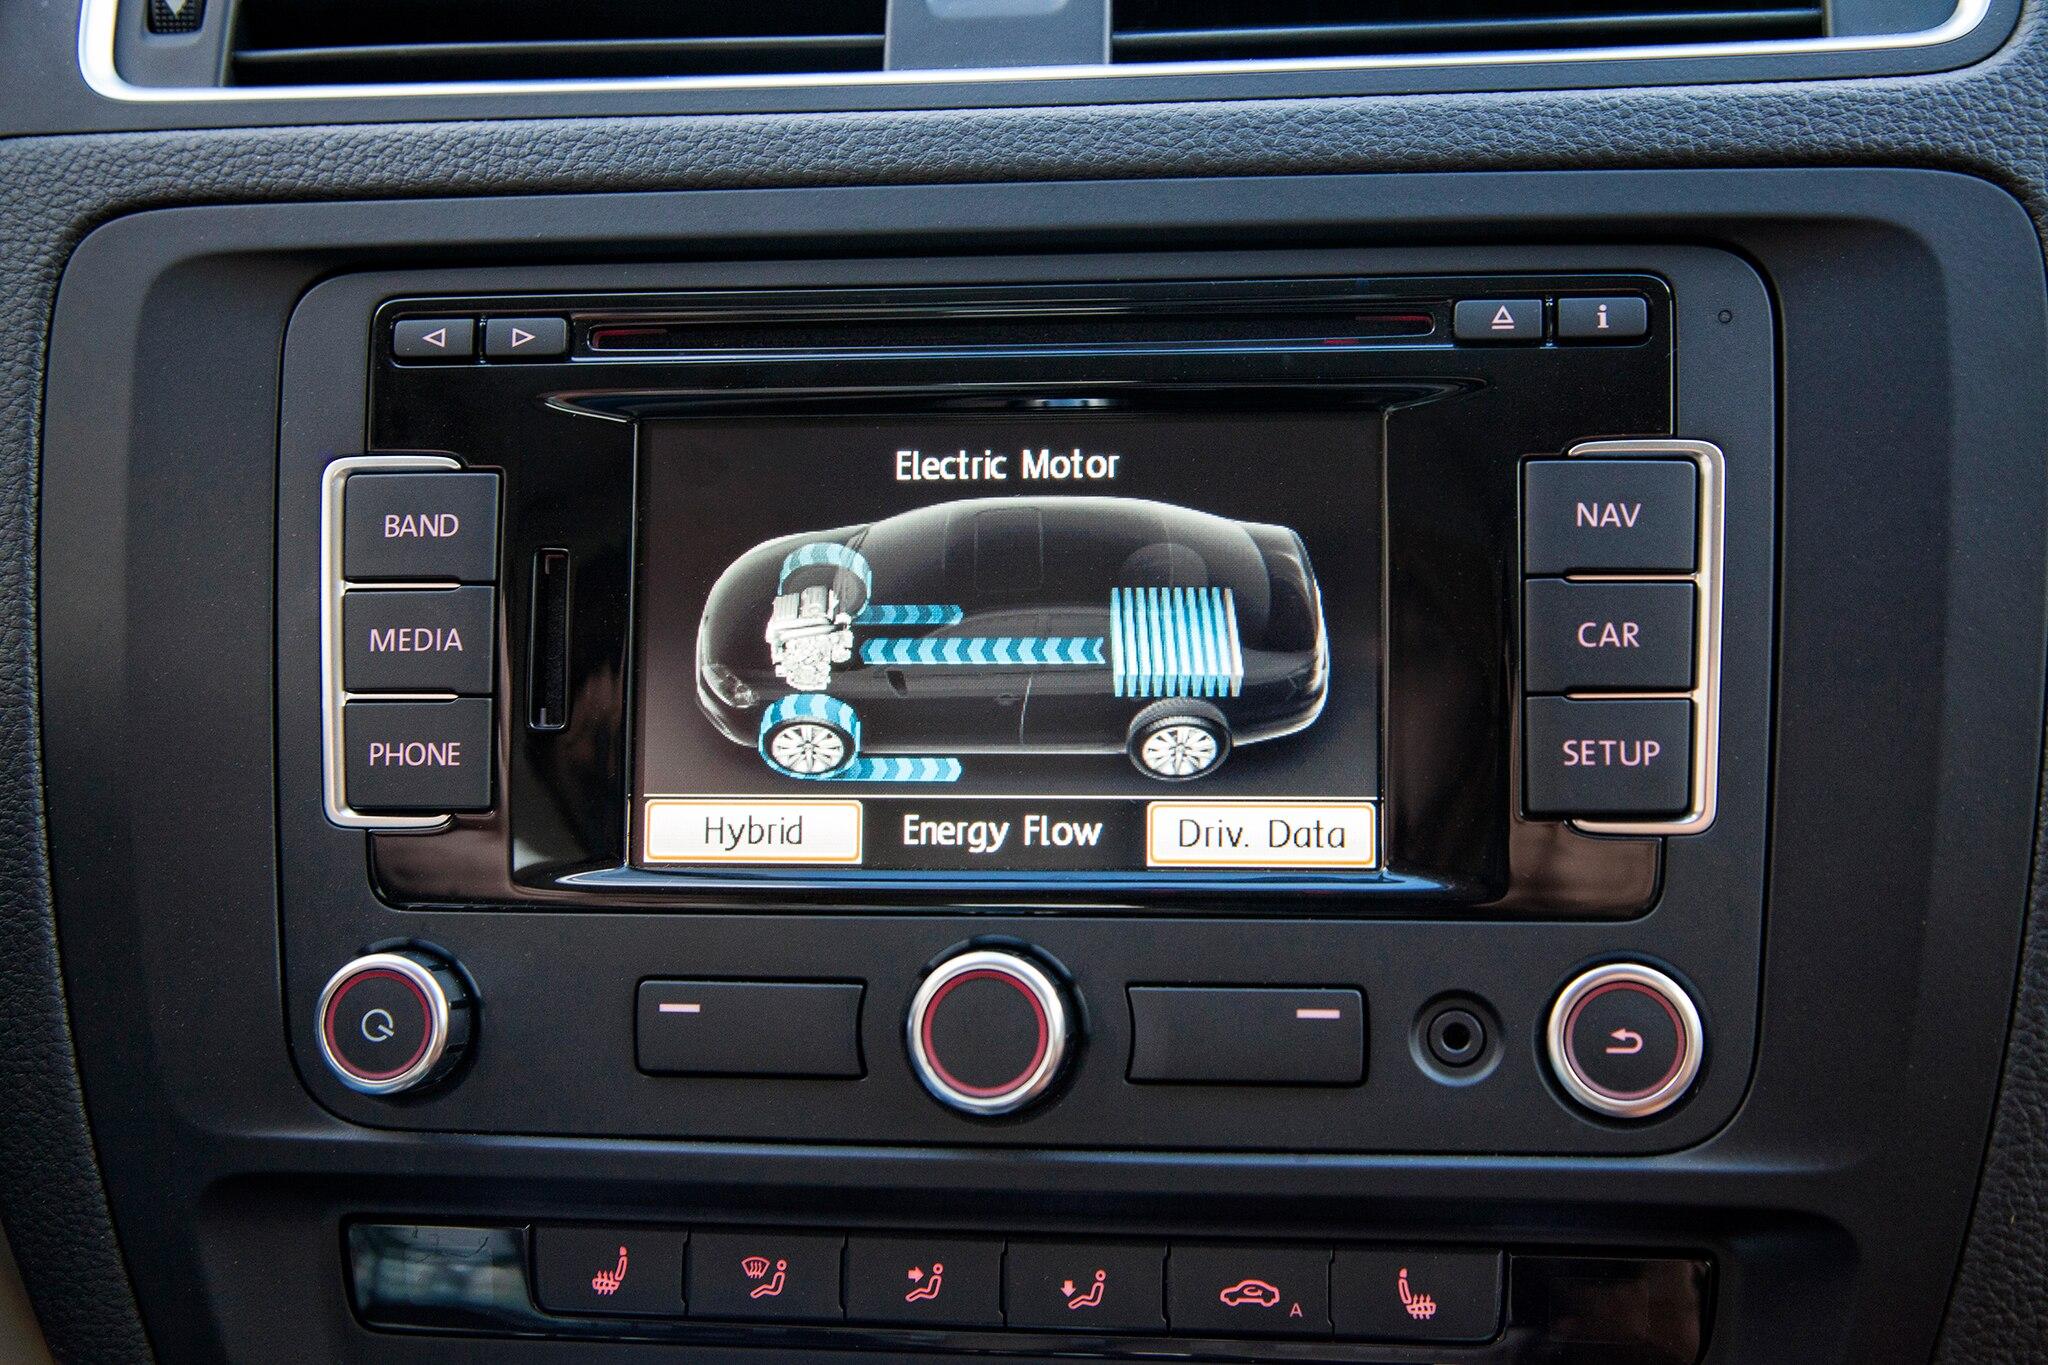 2014 jetta hybrid sel premium review